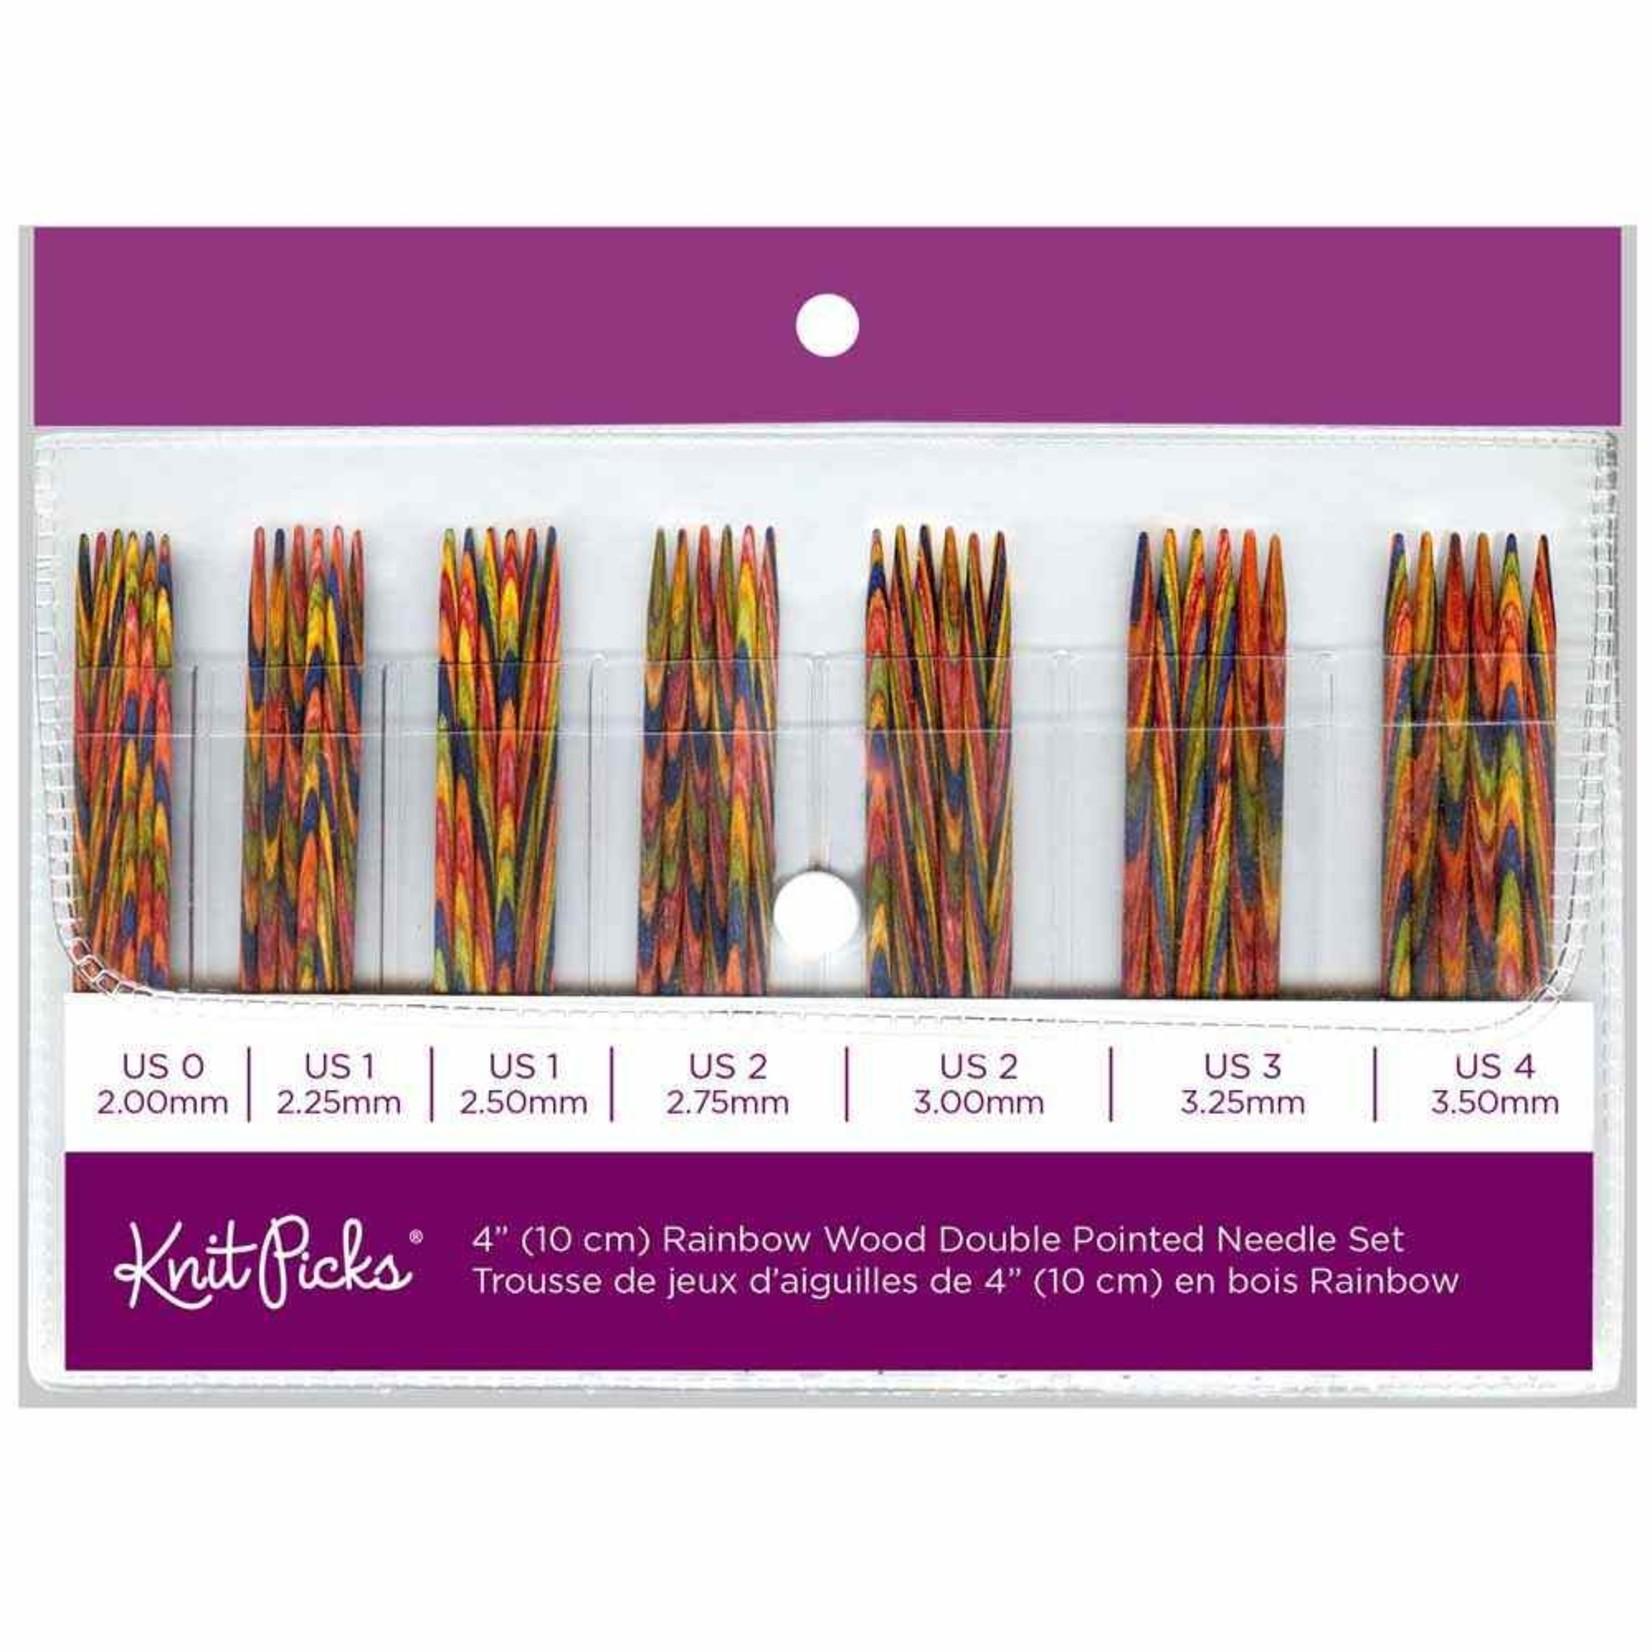 Knit Picks Knit Picks Rainbow DPN 5'' Kit